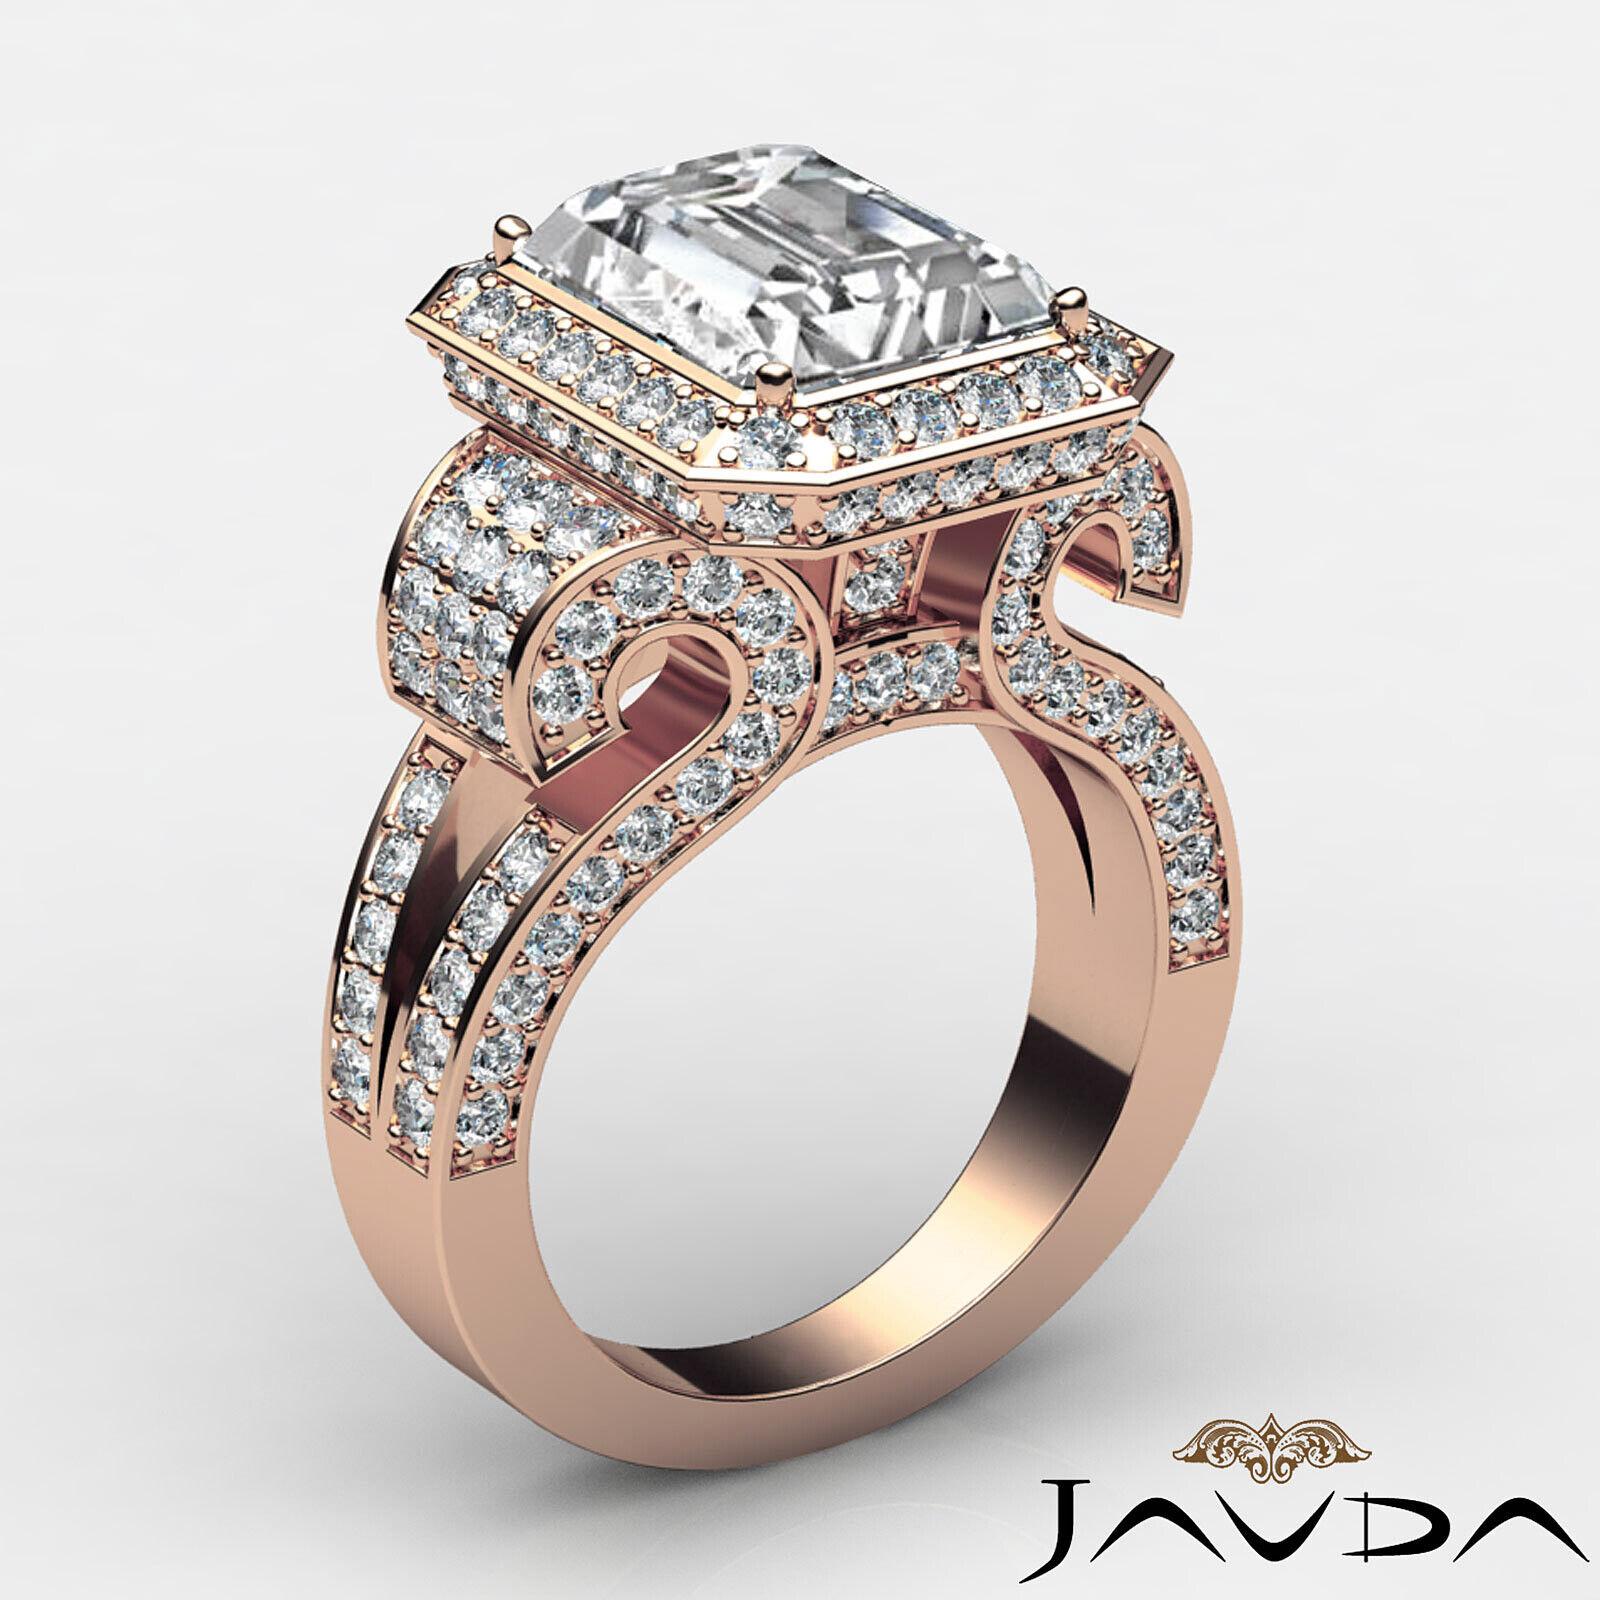 4.4ctw Antique Vintage Halo Emerald Diamond Engagement Ring GIA I-VS1 White Gold 11